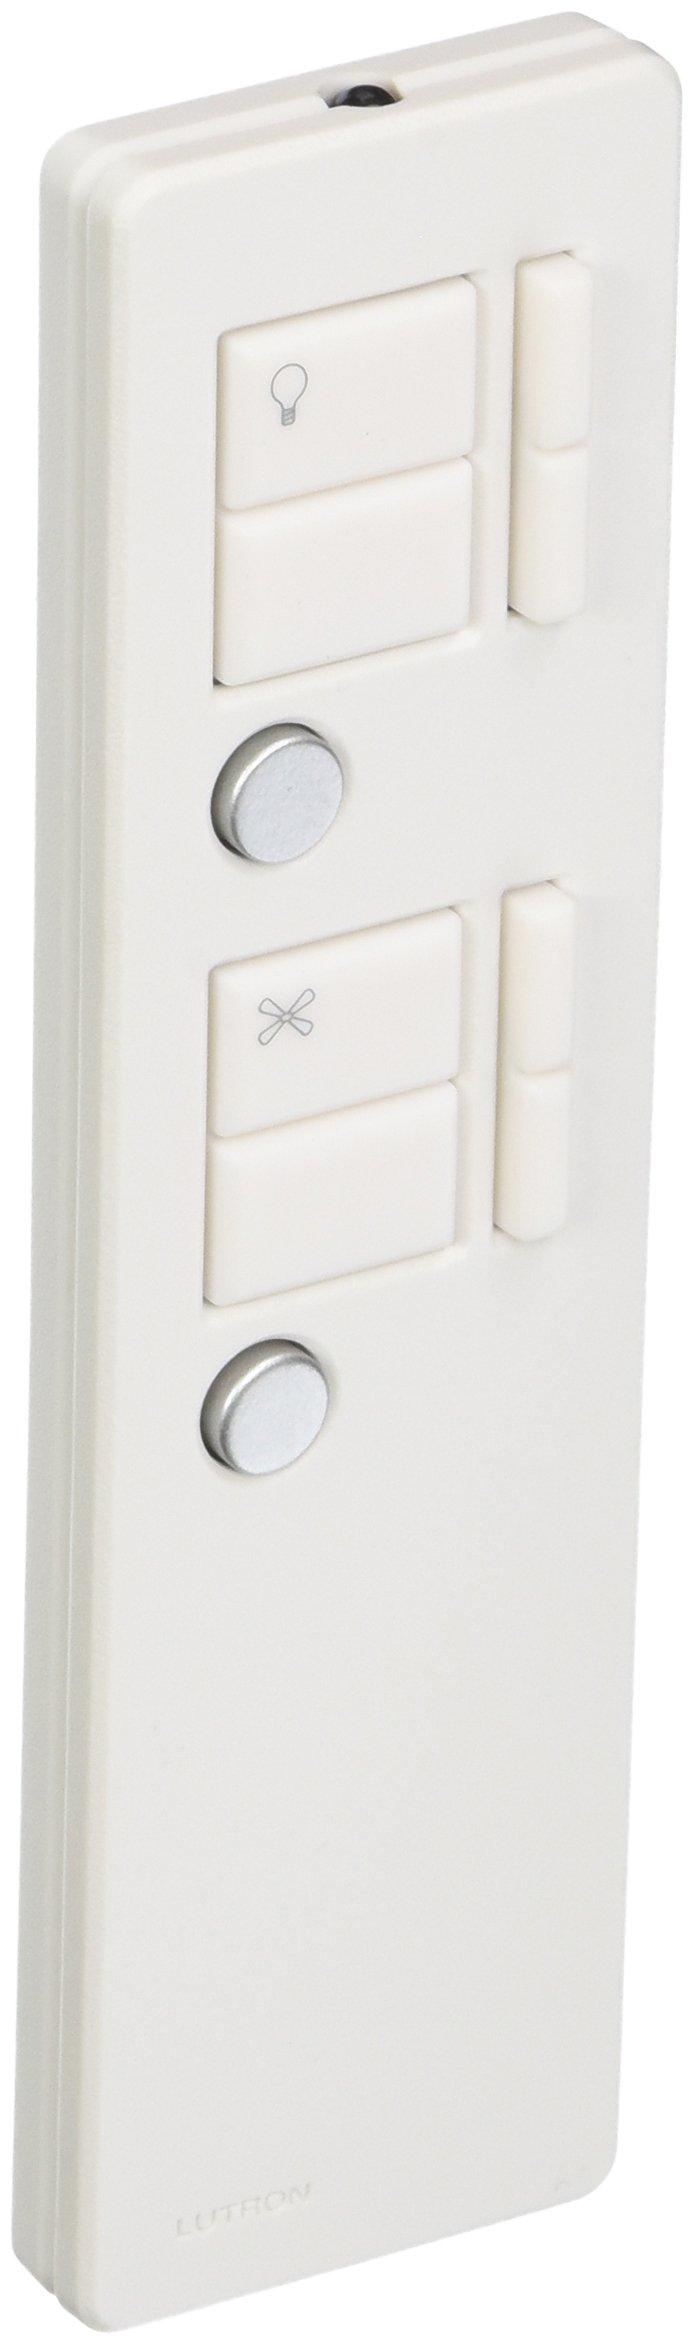 Lutron Electronics Co. MIR-ITFS-LF-WH Maestro IR Fan/Light Remote Control, White